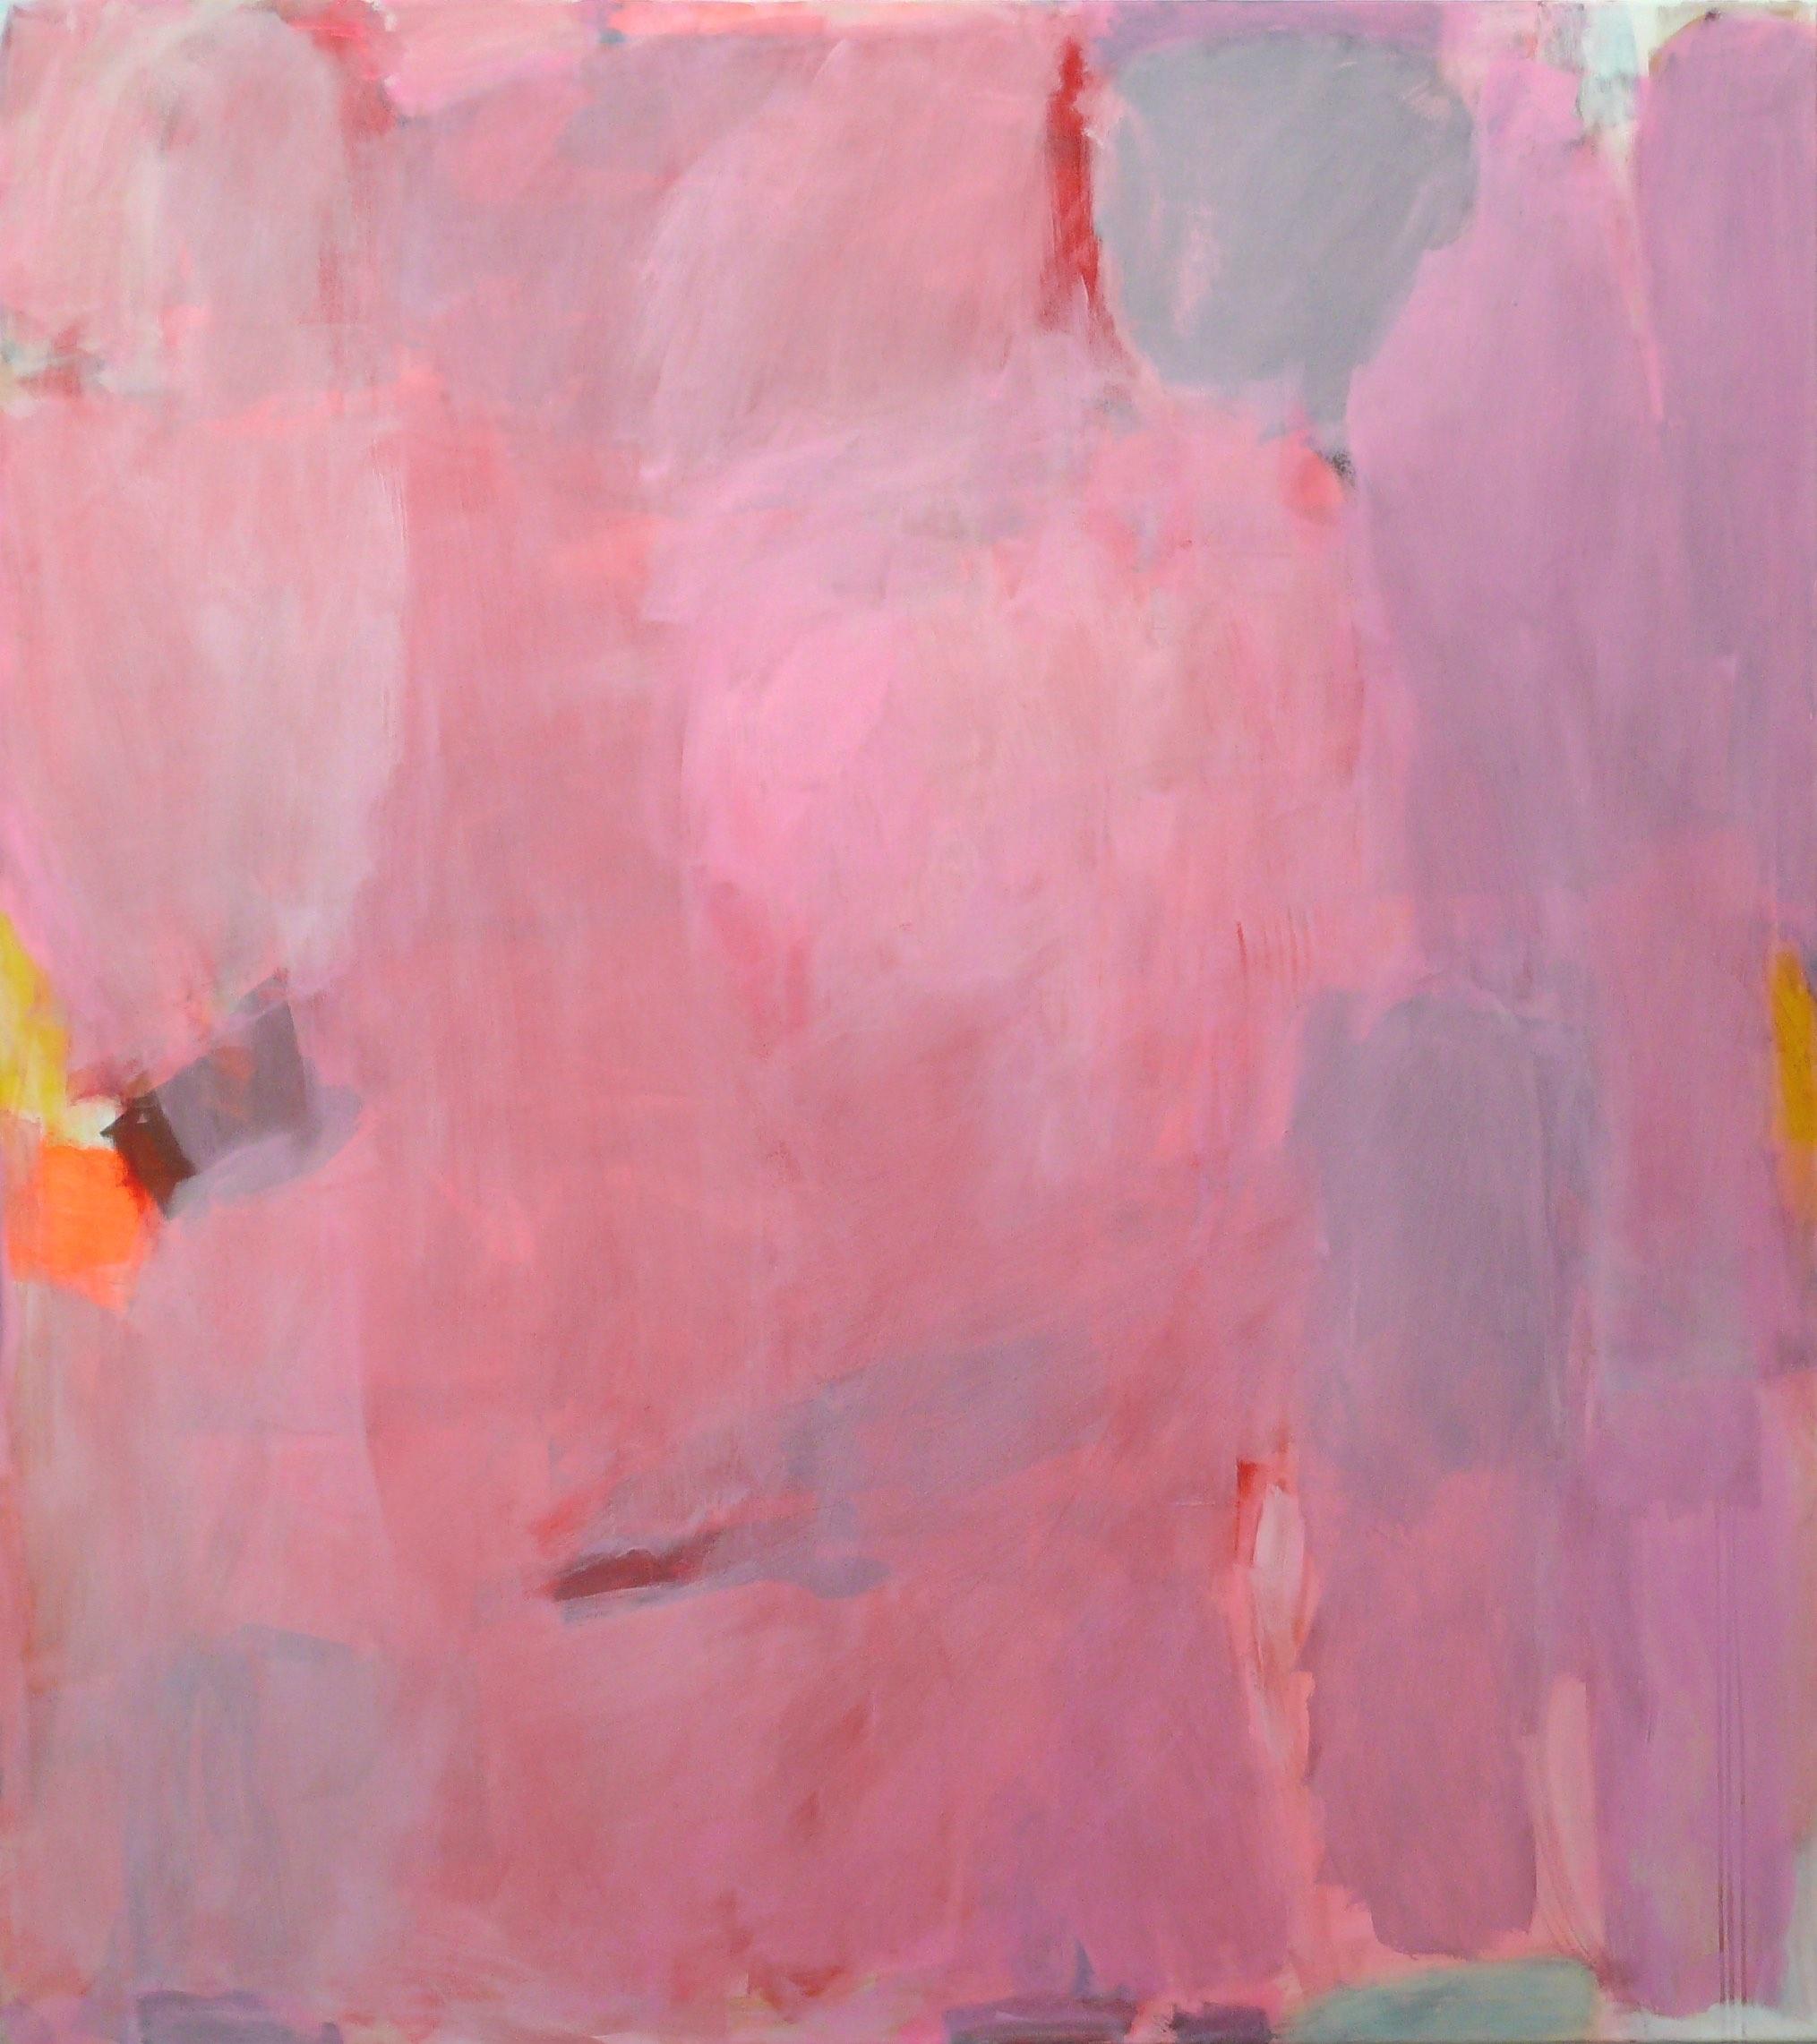 Meta, 2017, Acryl auf Leinwand, 180x160 cm